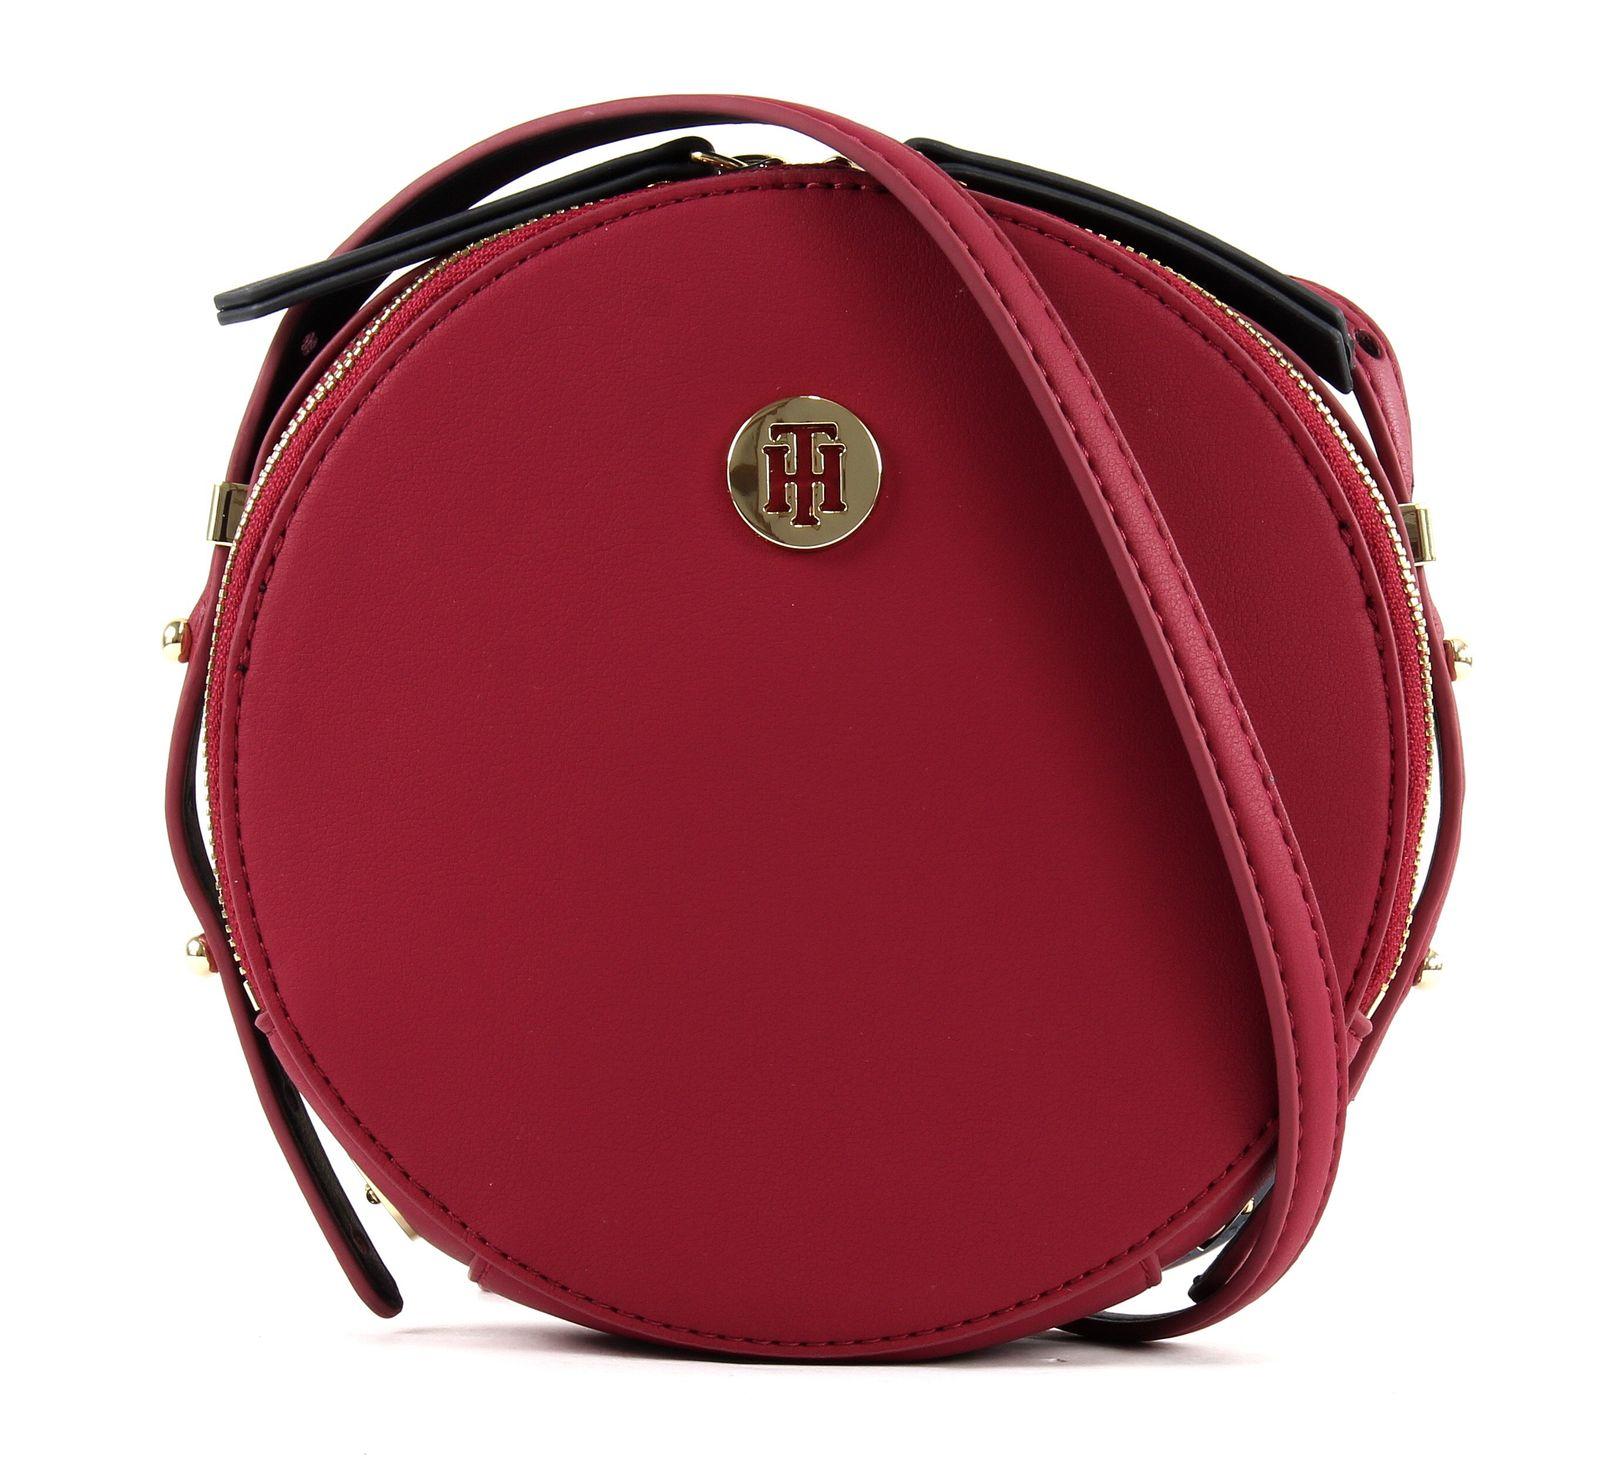 fbcb76bbc2957 TOMMY HILFIGER Modern Hardware Round Crossover Beet Red